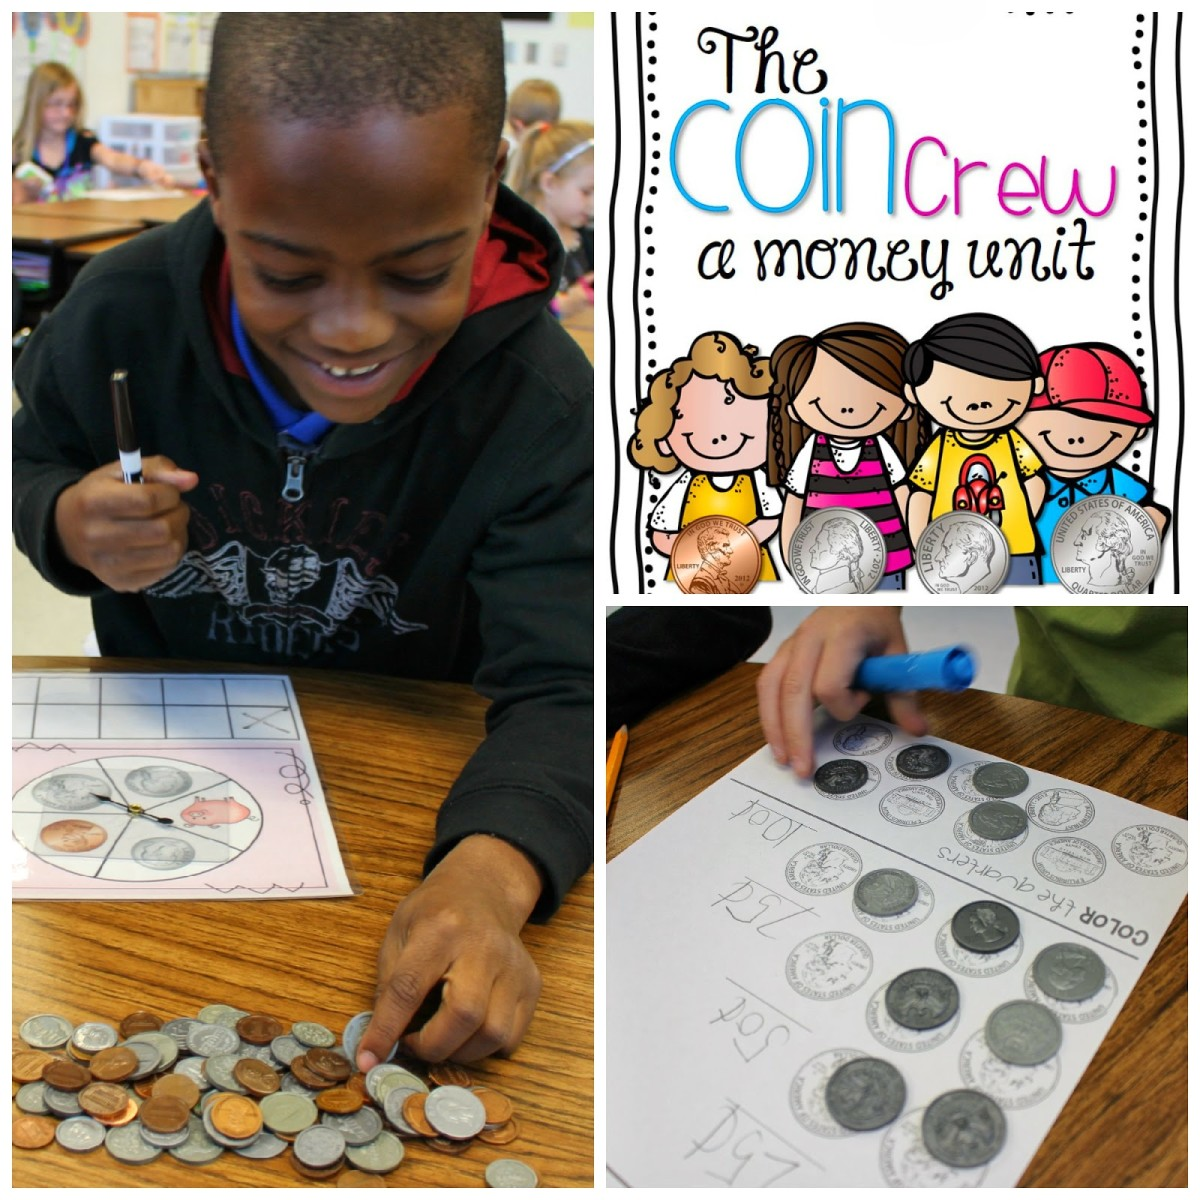 http://www.teacherspayteachers.com/Product/The-Coin-Crew-A-Money-Unit-1169008